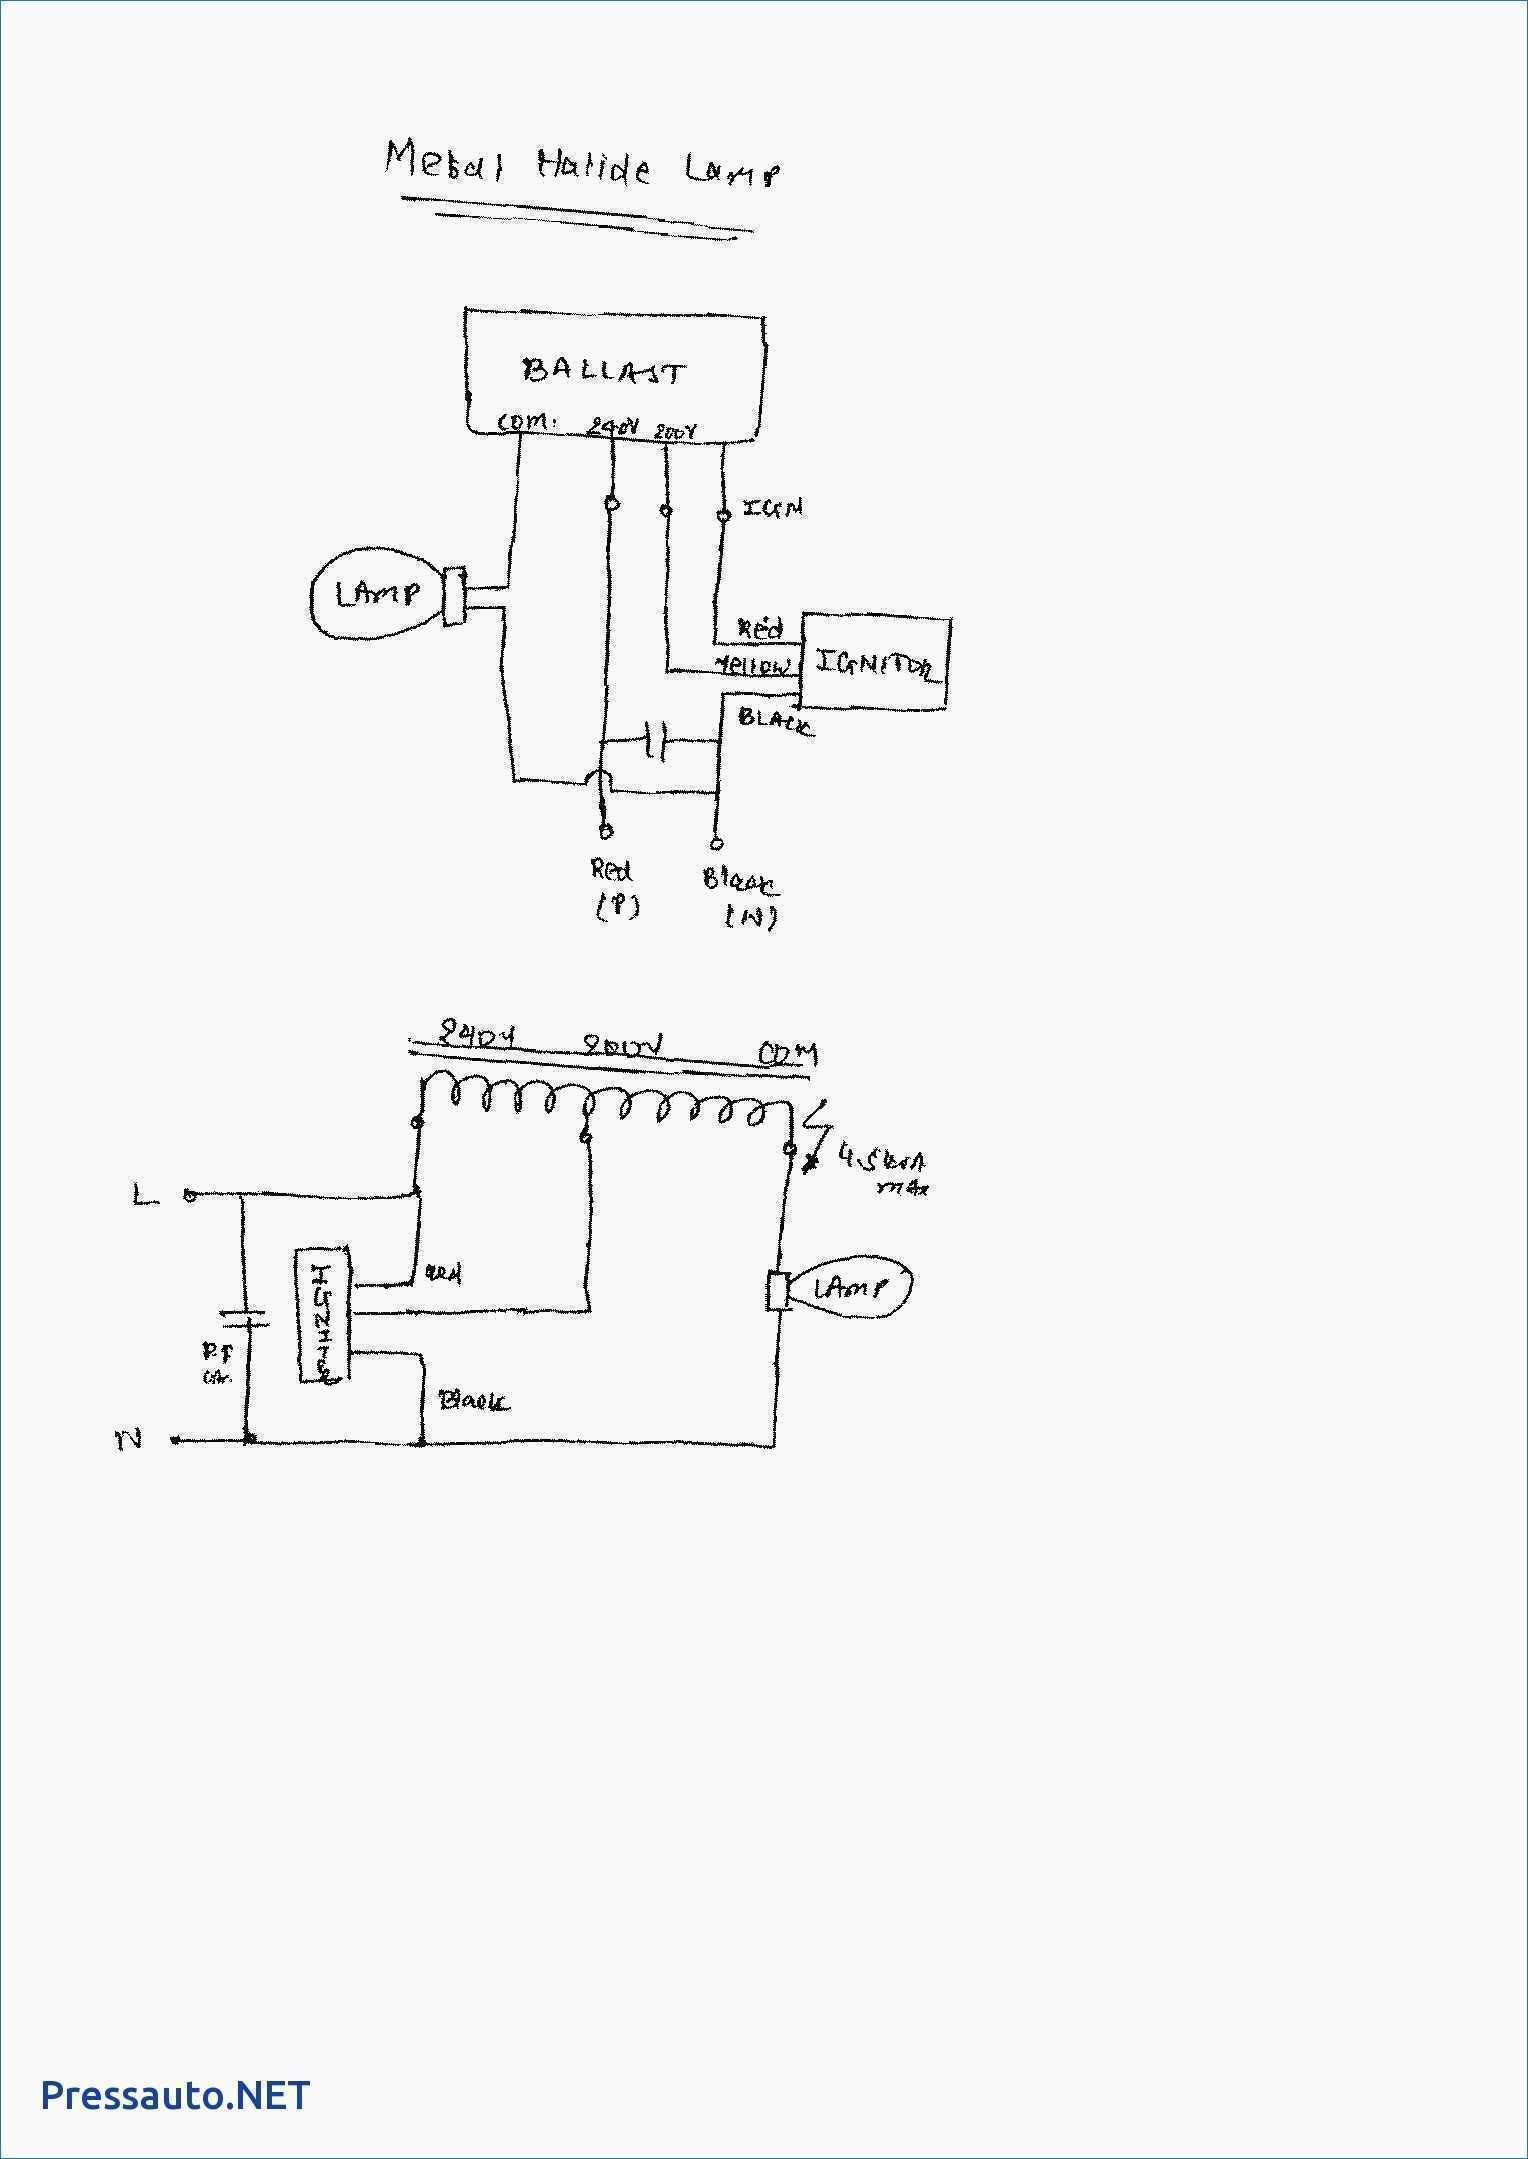 DIAGRAM] Holophane Mh Wiring Diagram FULL Version HD Quality Wiring Diagram  - LADDERDIAGRAM.CEFALUBB.IT | Ge Metal Halide Ballast Wiring Diagram |  | Diagram Database